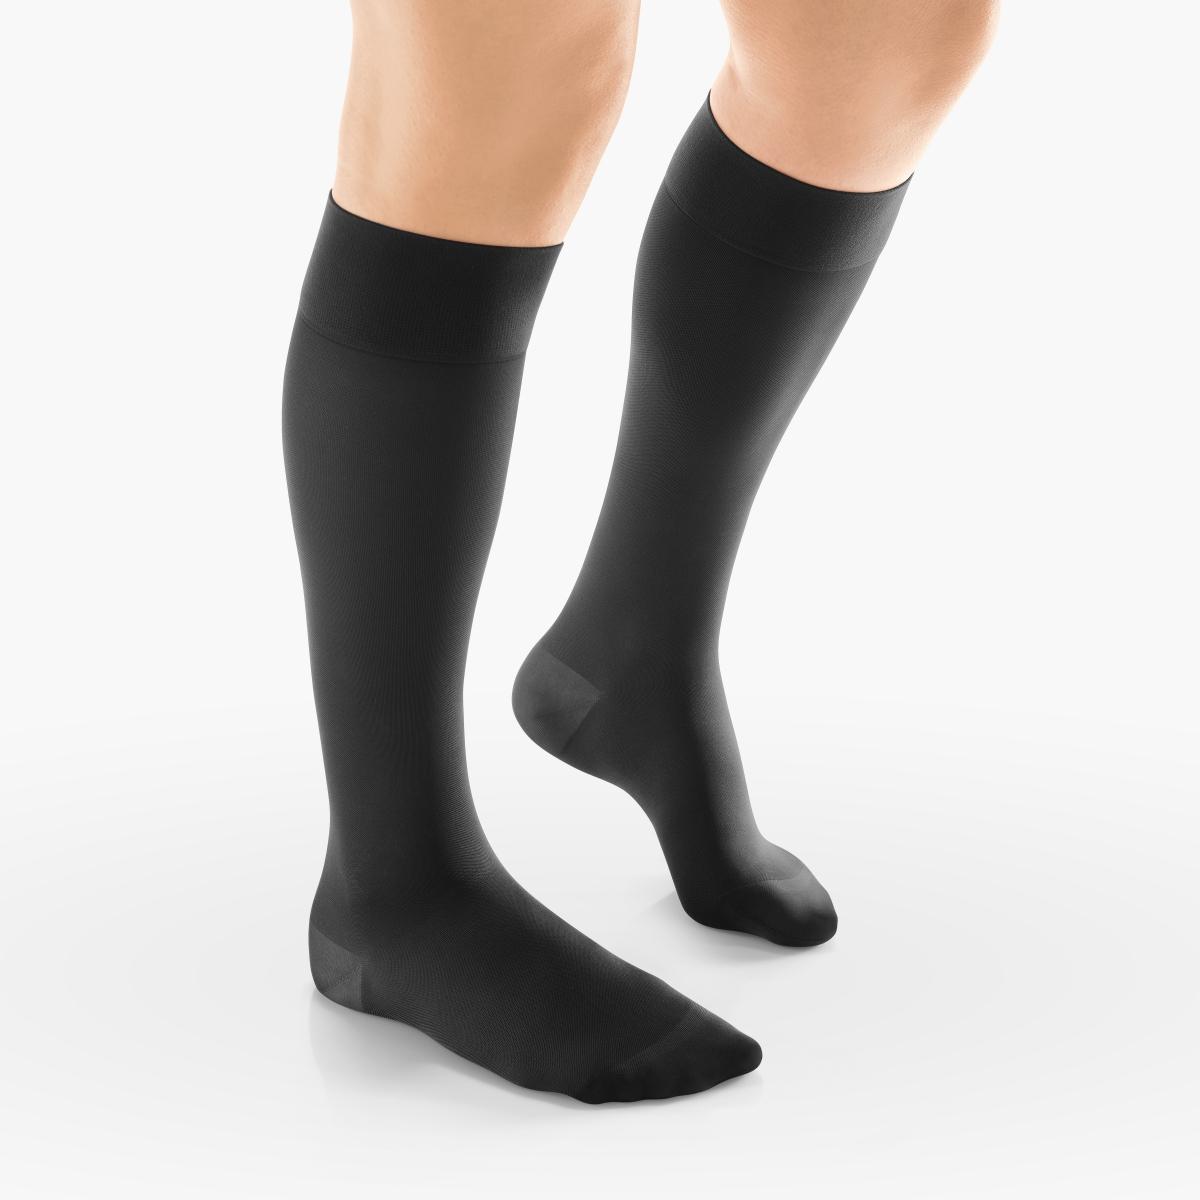 VENOSAN Sup F Women, Classic, Below Knee 15-20, Black, S/M, Regular Moderate 15-20 mmHg | Black | S/M | Regular | Closed Toe | Knit Top